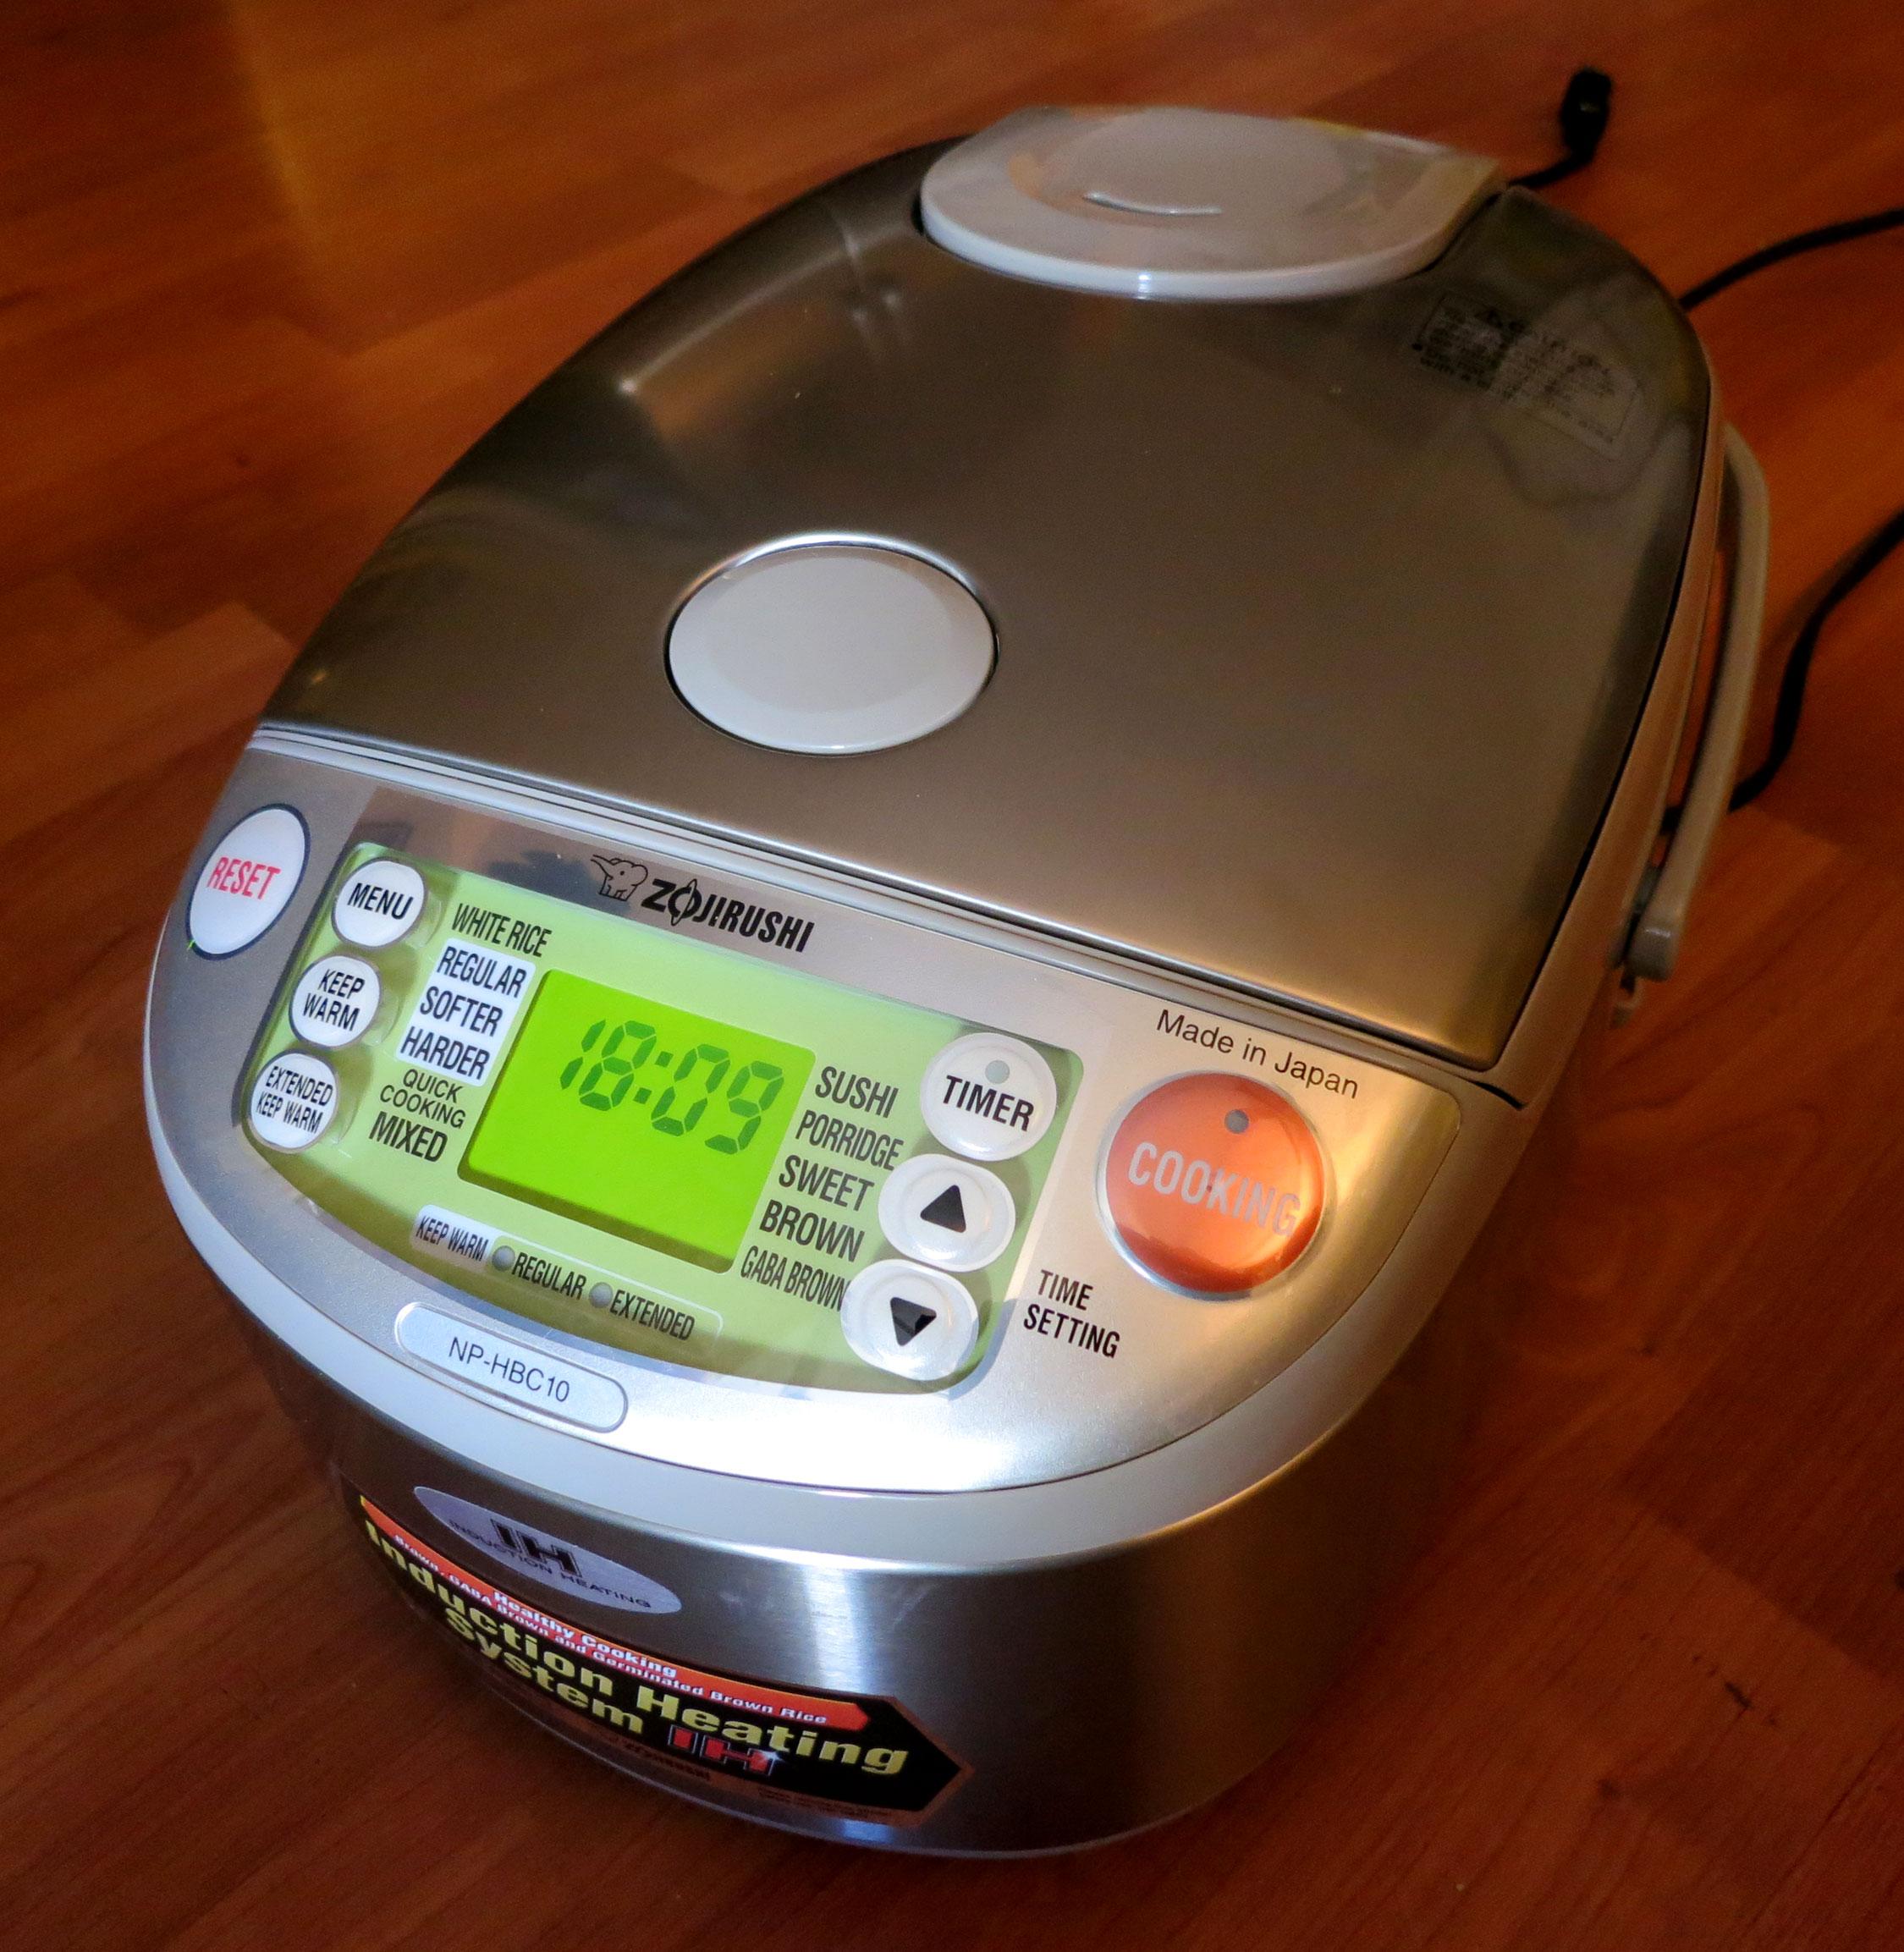 Review: Zojirushi Induction Heat Rice Cooker